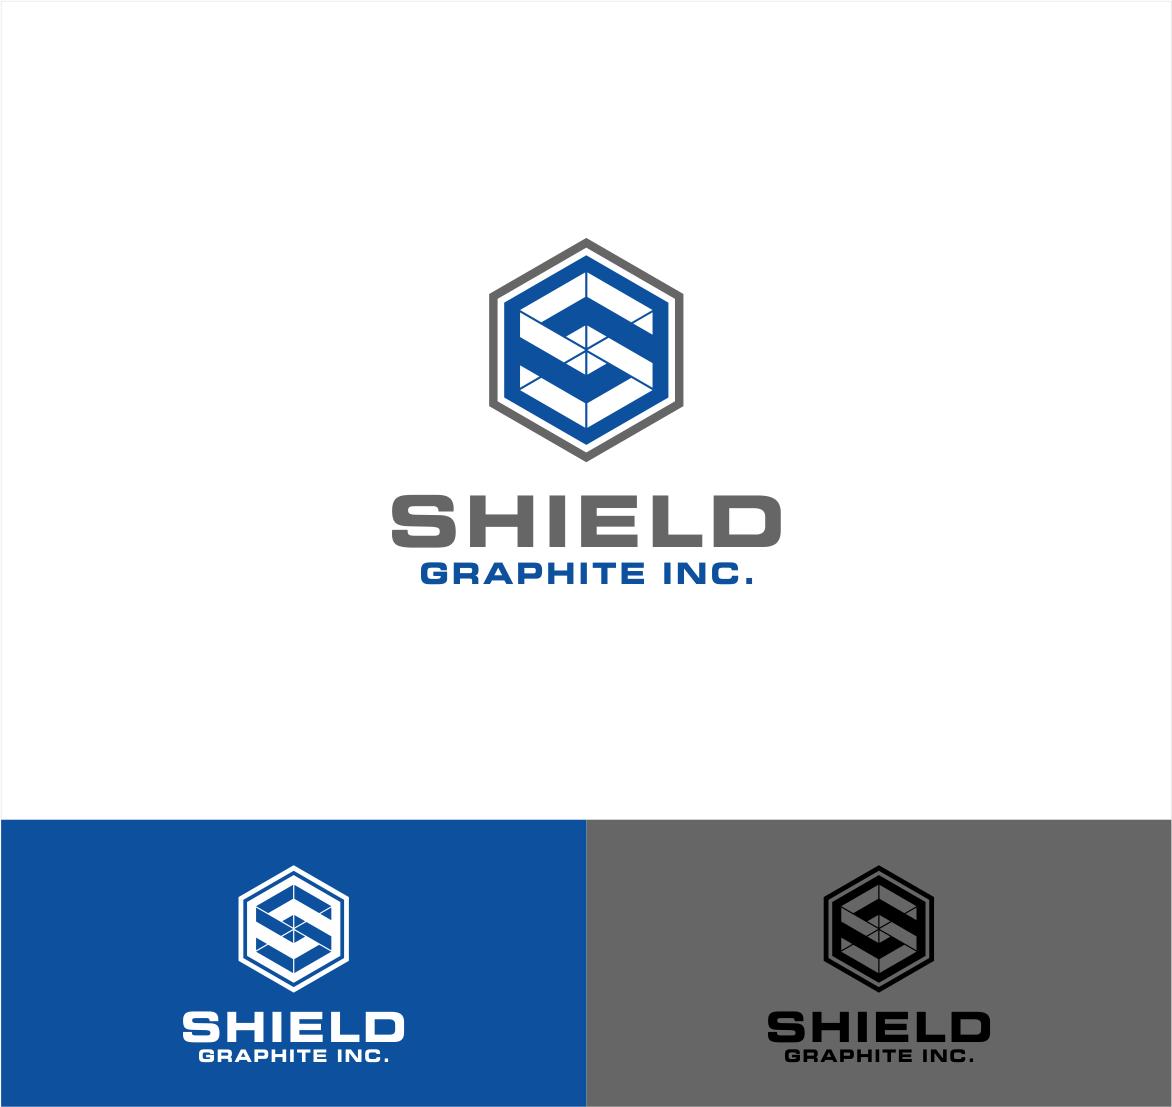 Logo Design by haidu - Entry No. 76 in the Logo Design Contest Imaginative Logo Design for Shield Graphite Inc..